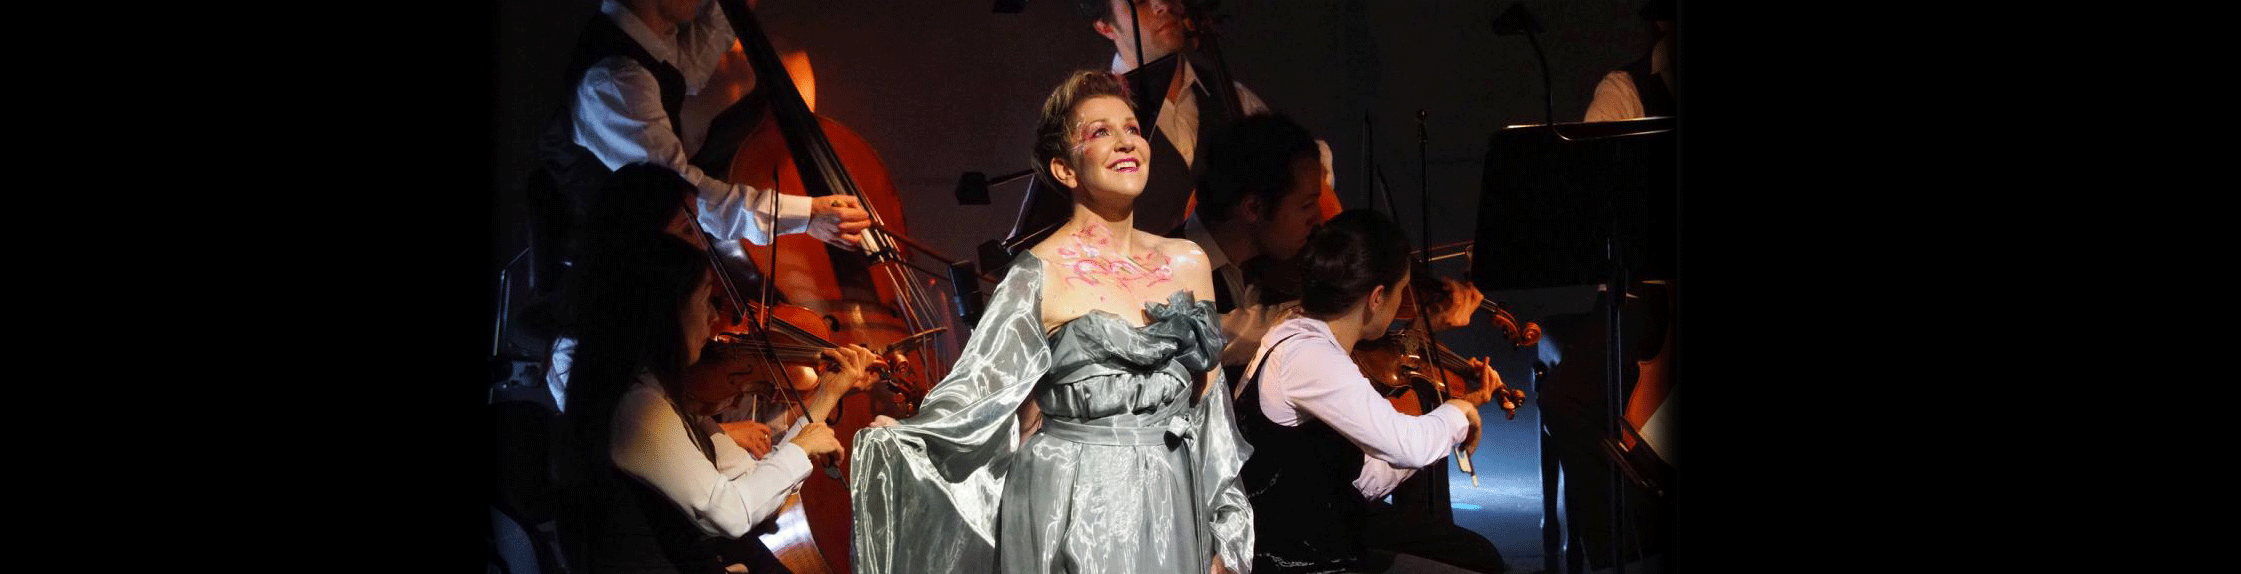 Joyce DiDonato sings In War and Peace: Harmony through Music